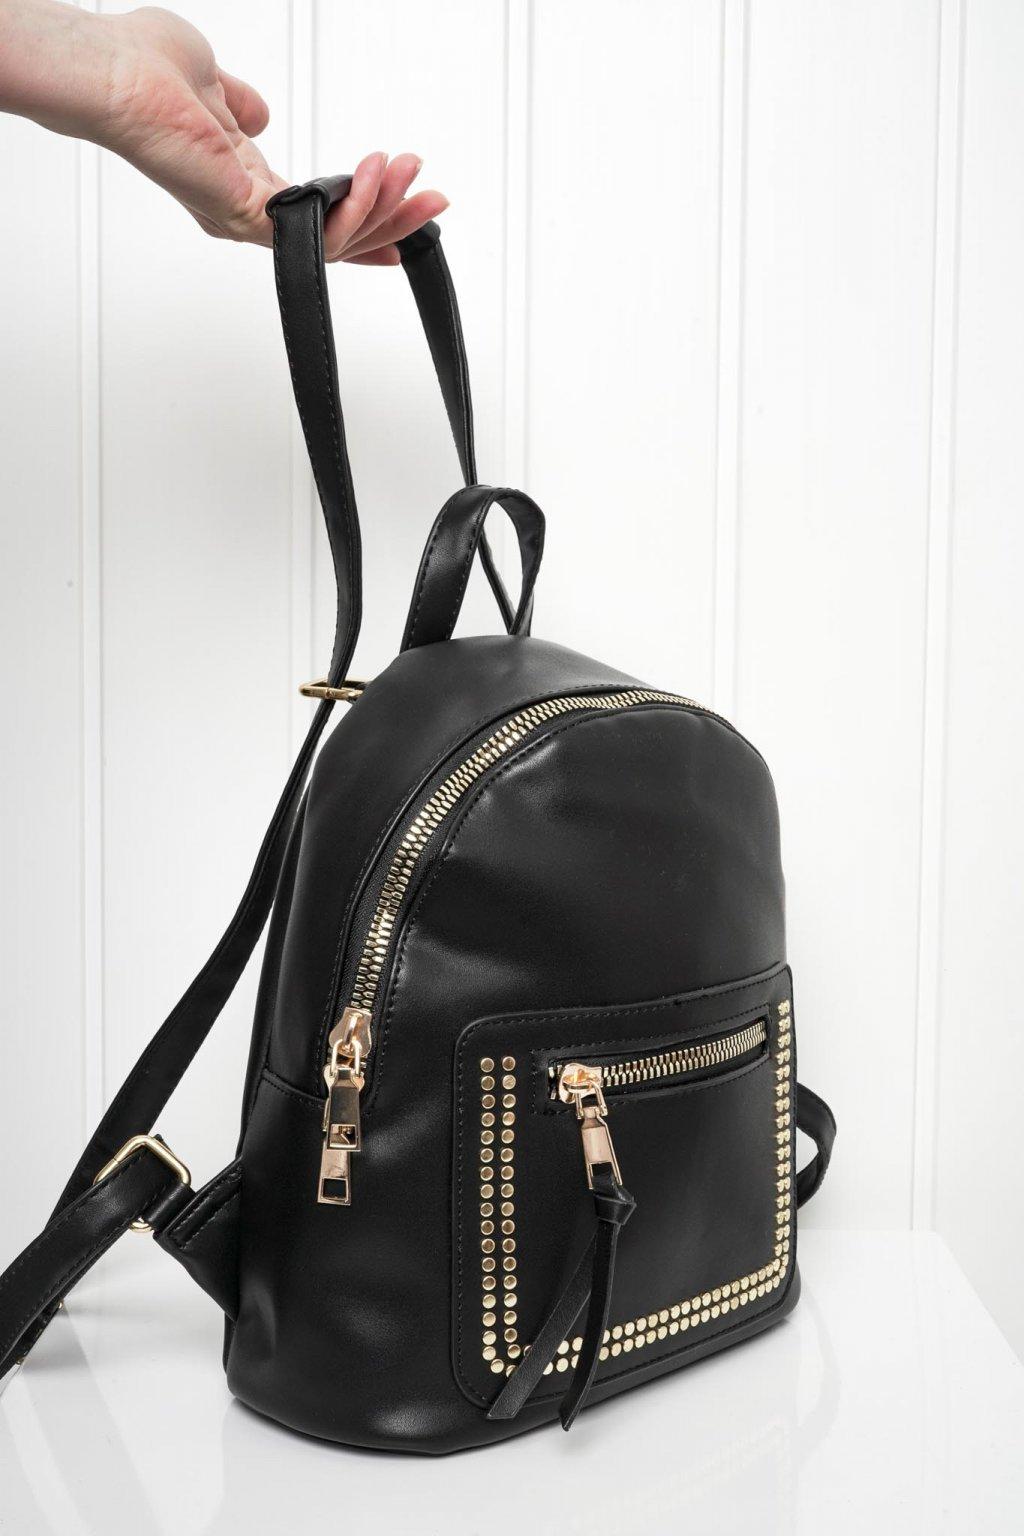 Kabelka, crossbody, ruksak, shopping bag, shopperka, 363